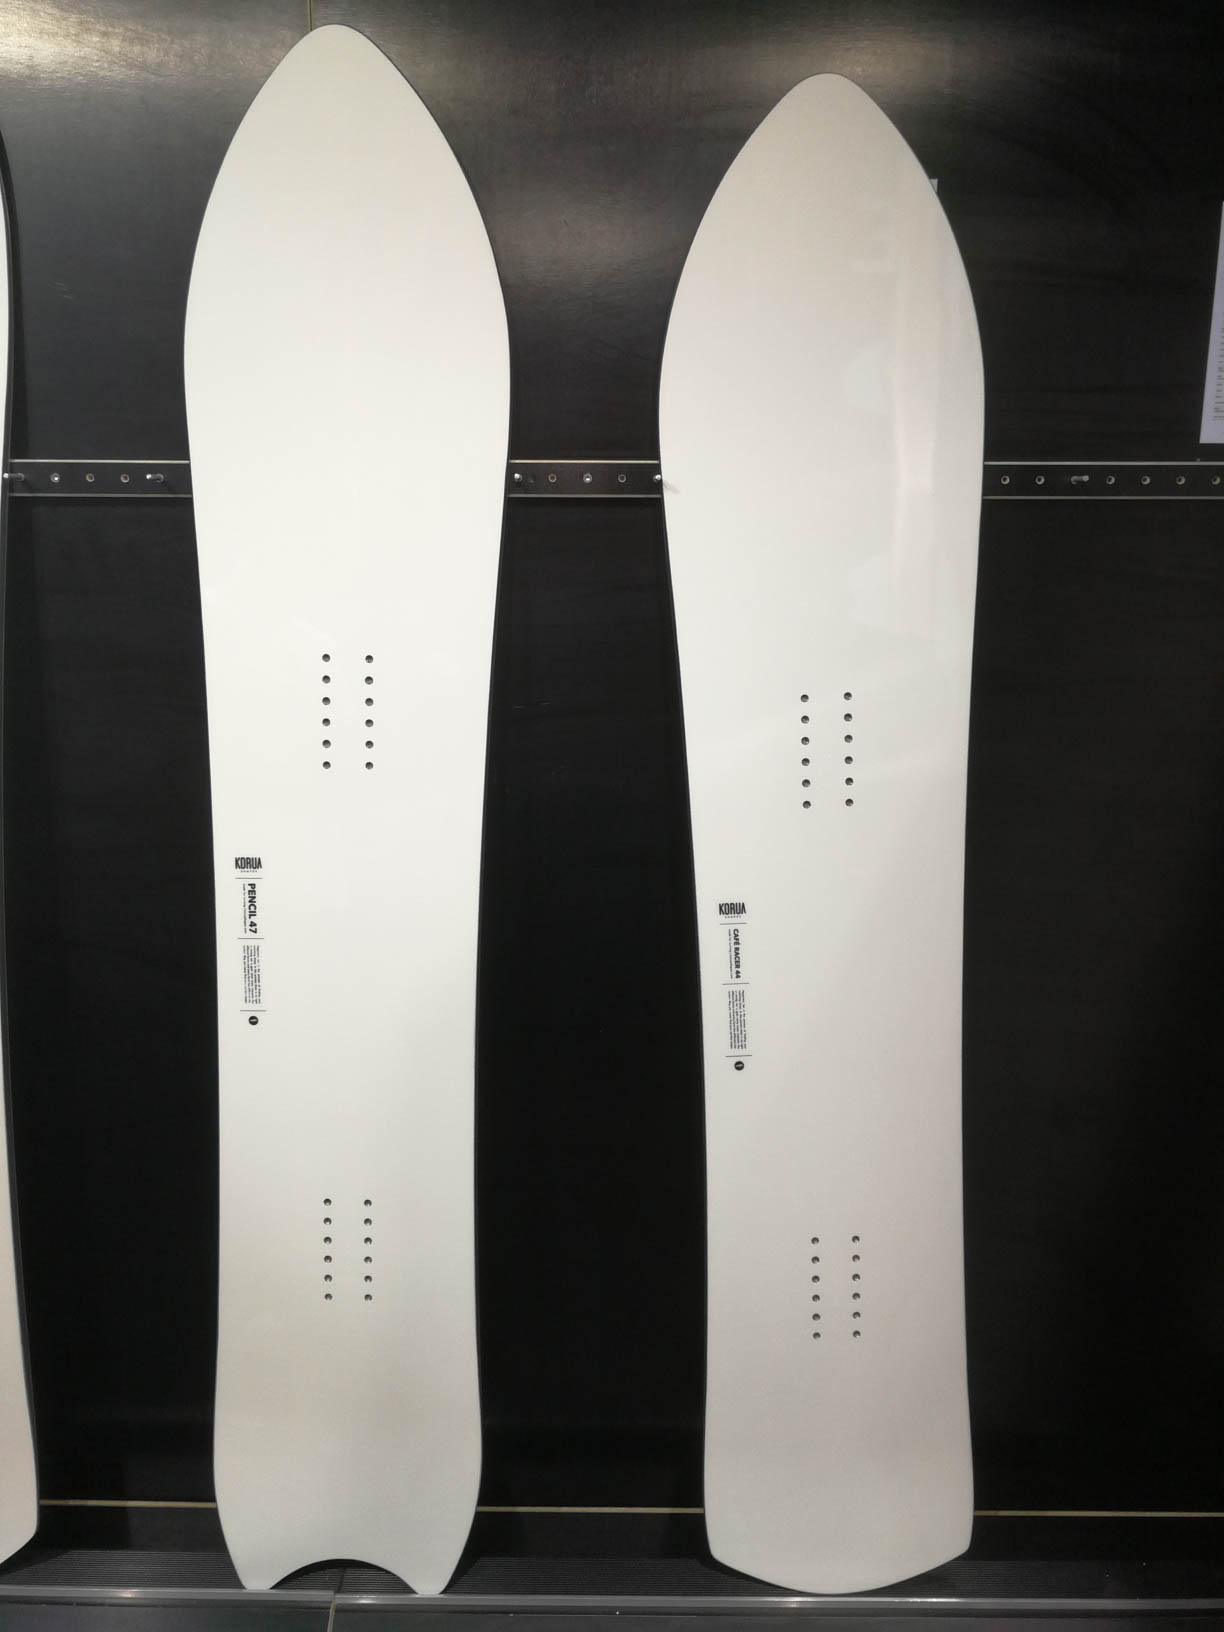 Korua Shapes 18/19: Pencil (rechts), Café Racer (links)